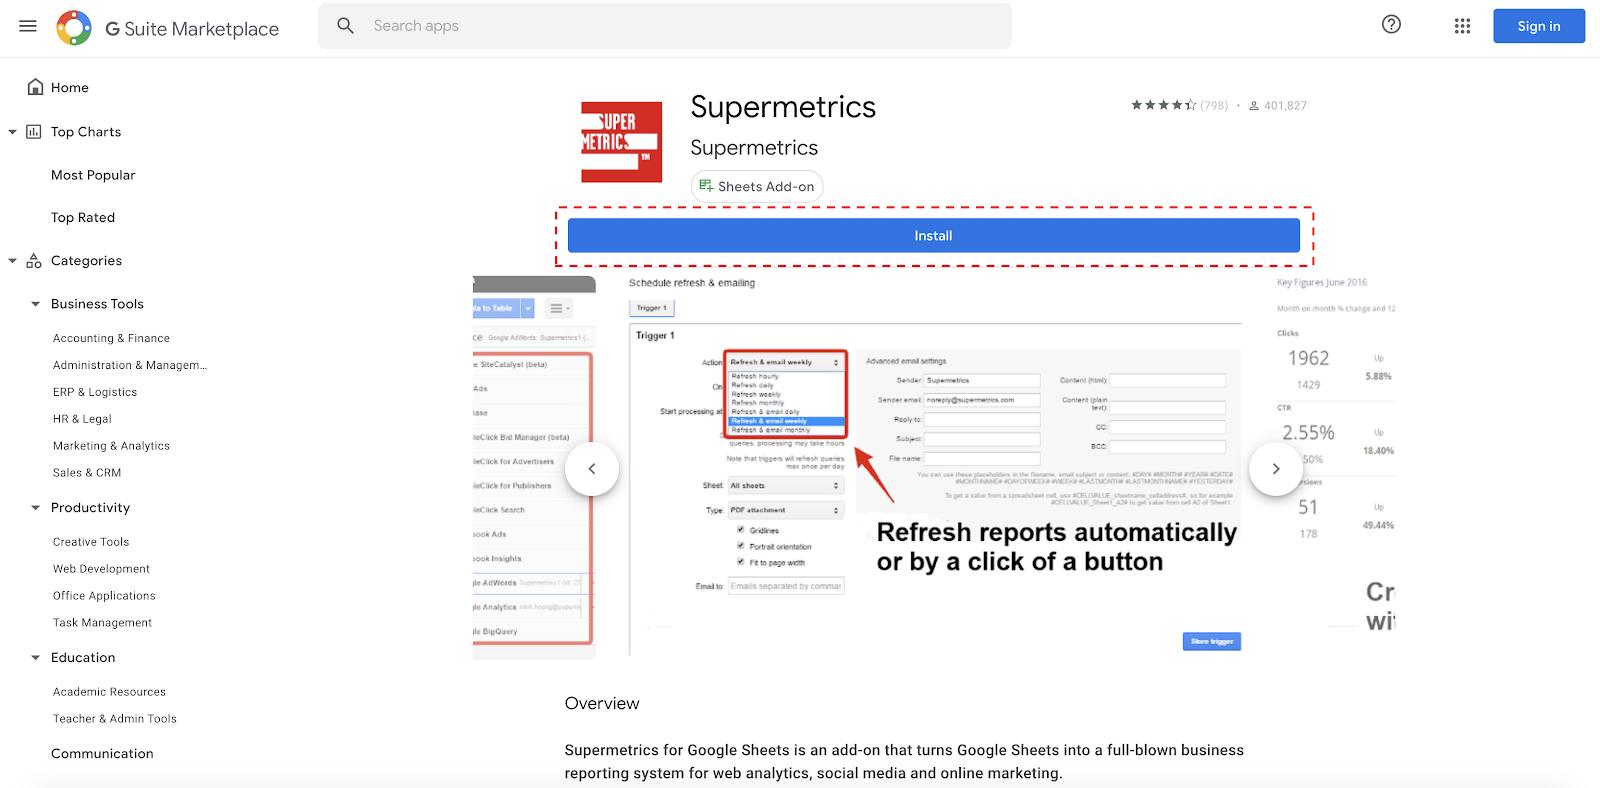 Supermetrics for Google Sheets Install